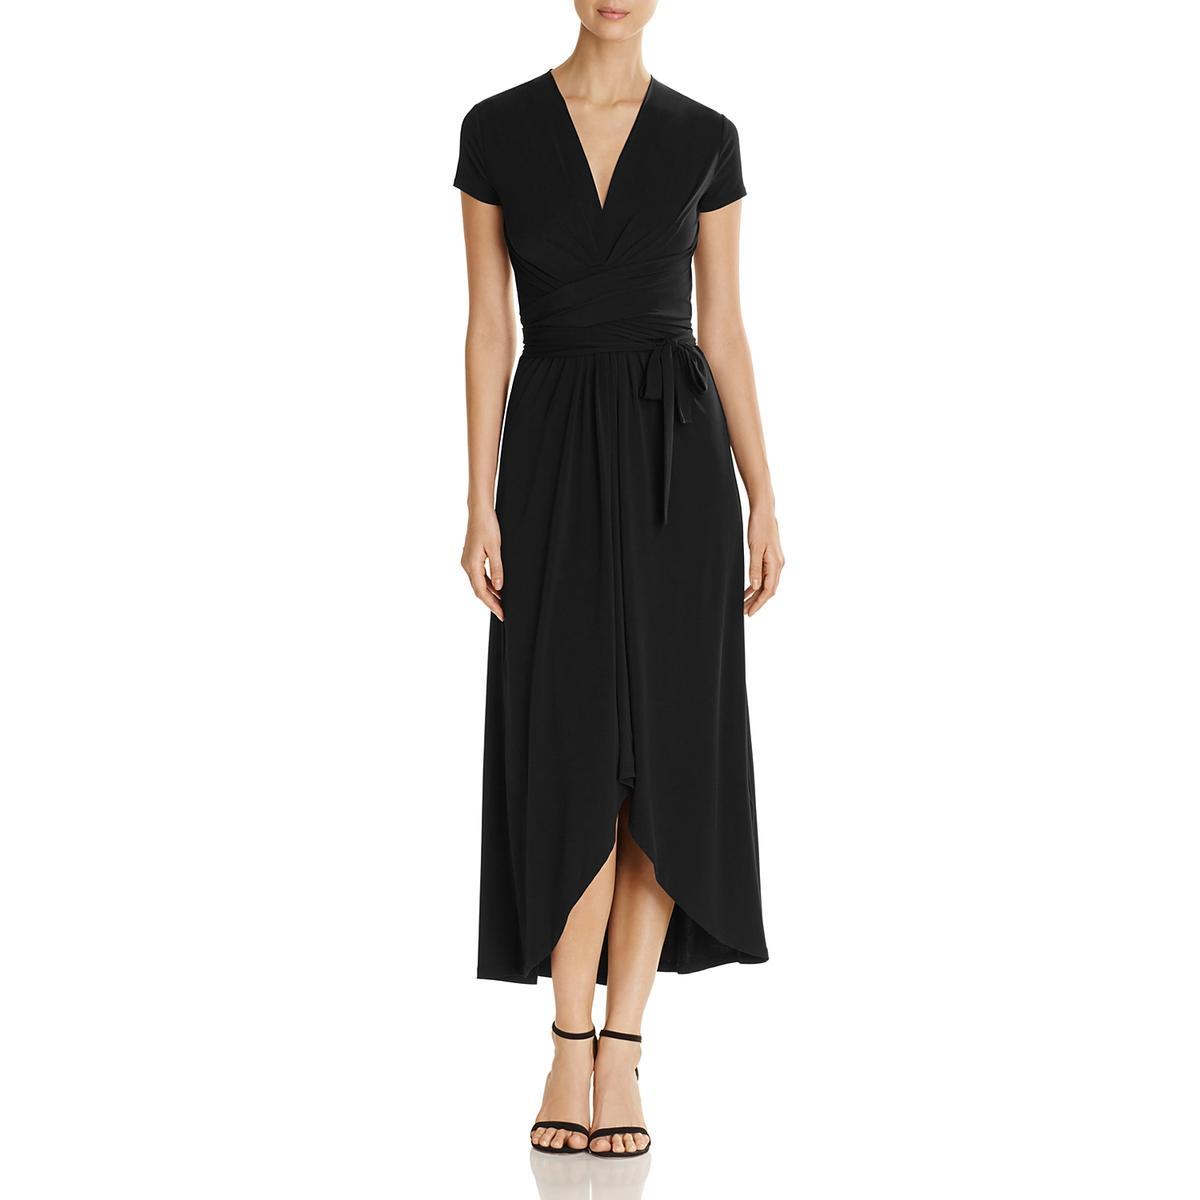 Black Cap Sleeve Maxi Dress